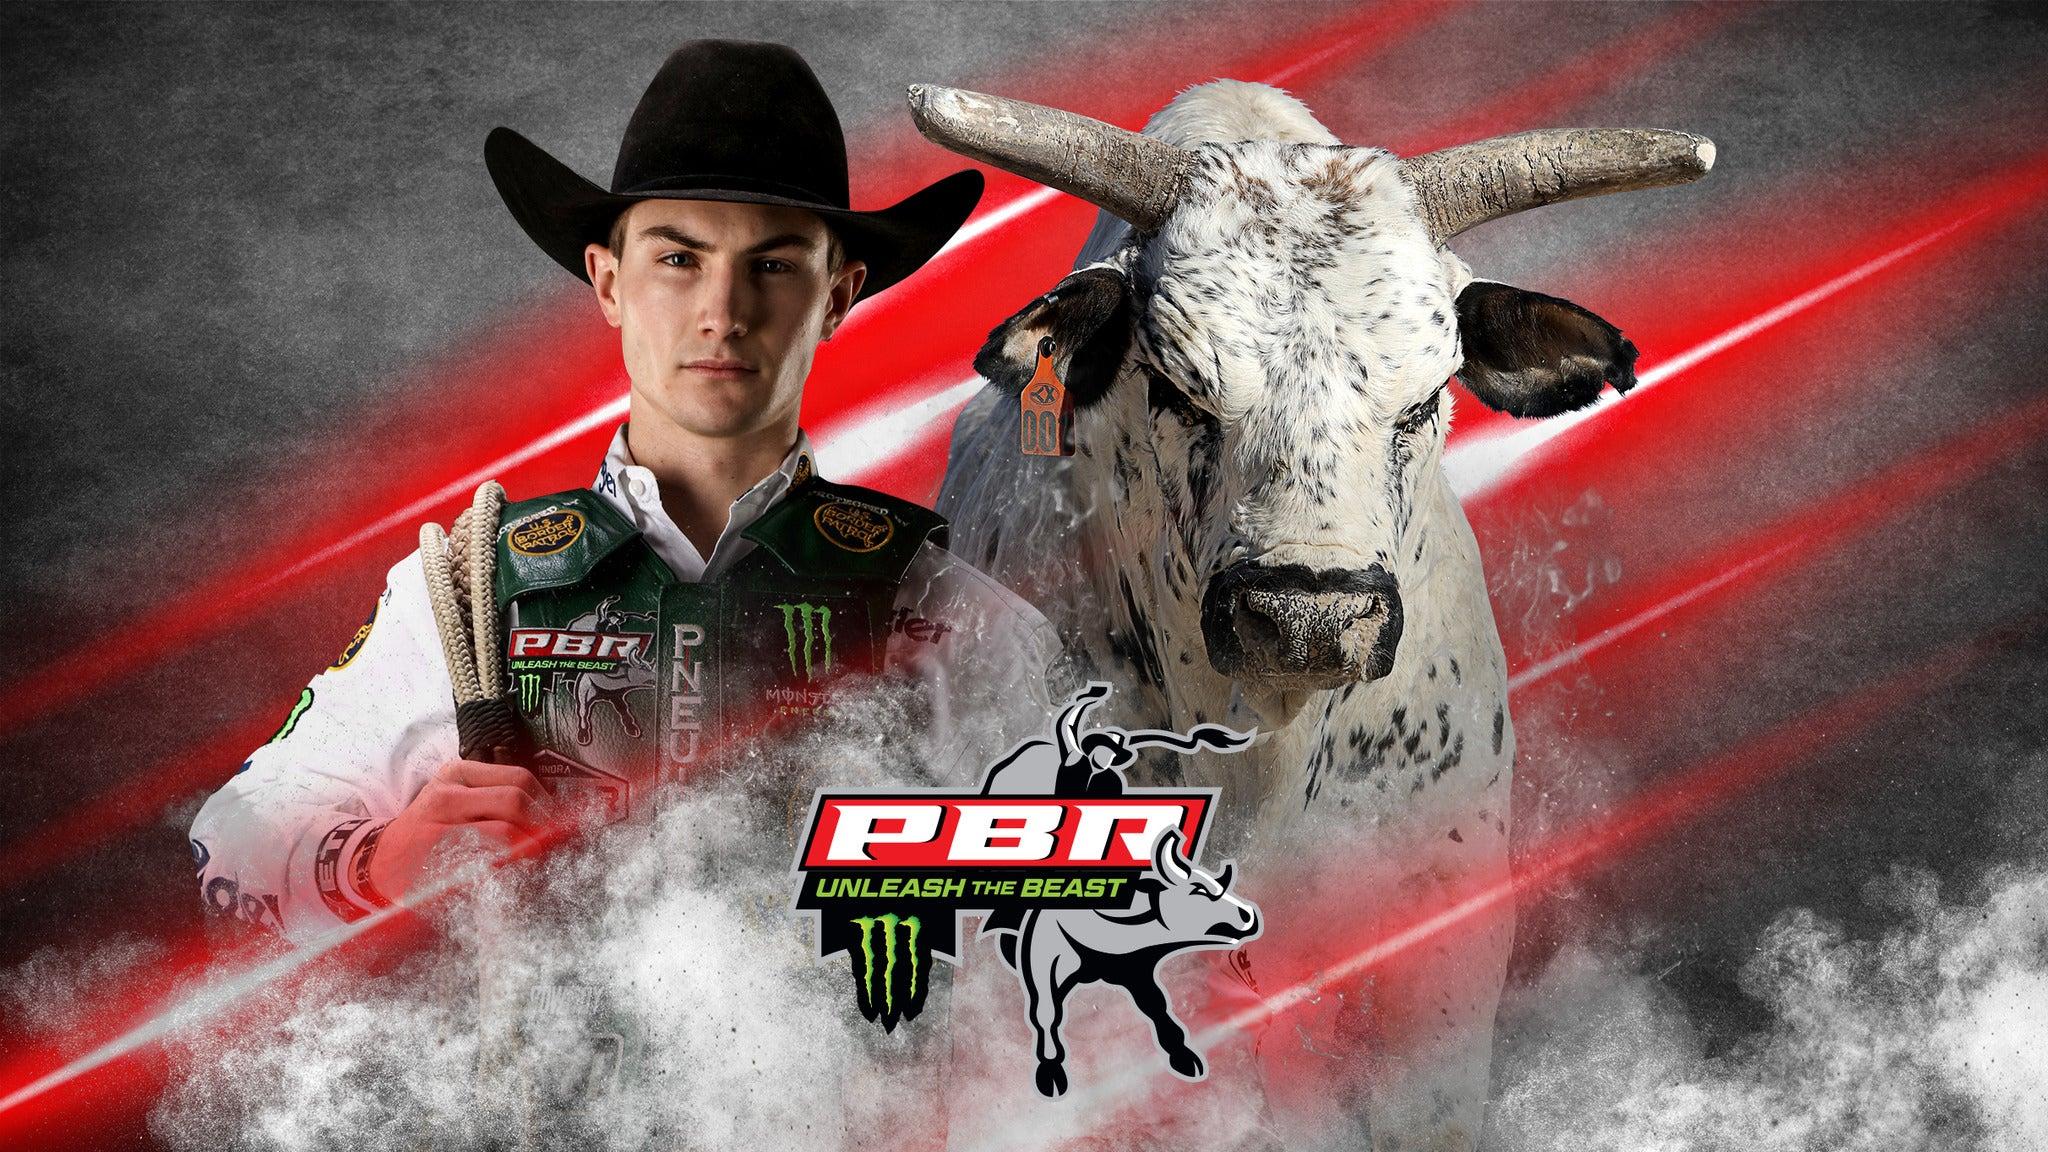 PBR: Unleash the Beast at Honda Center